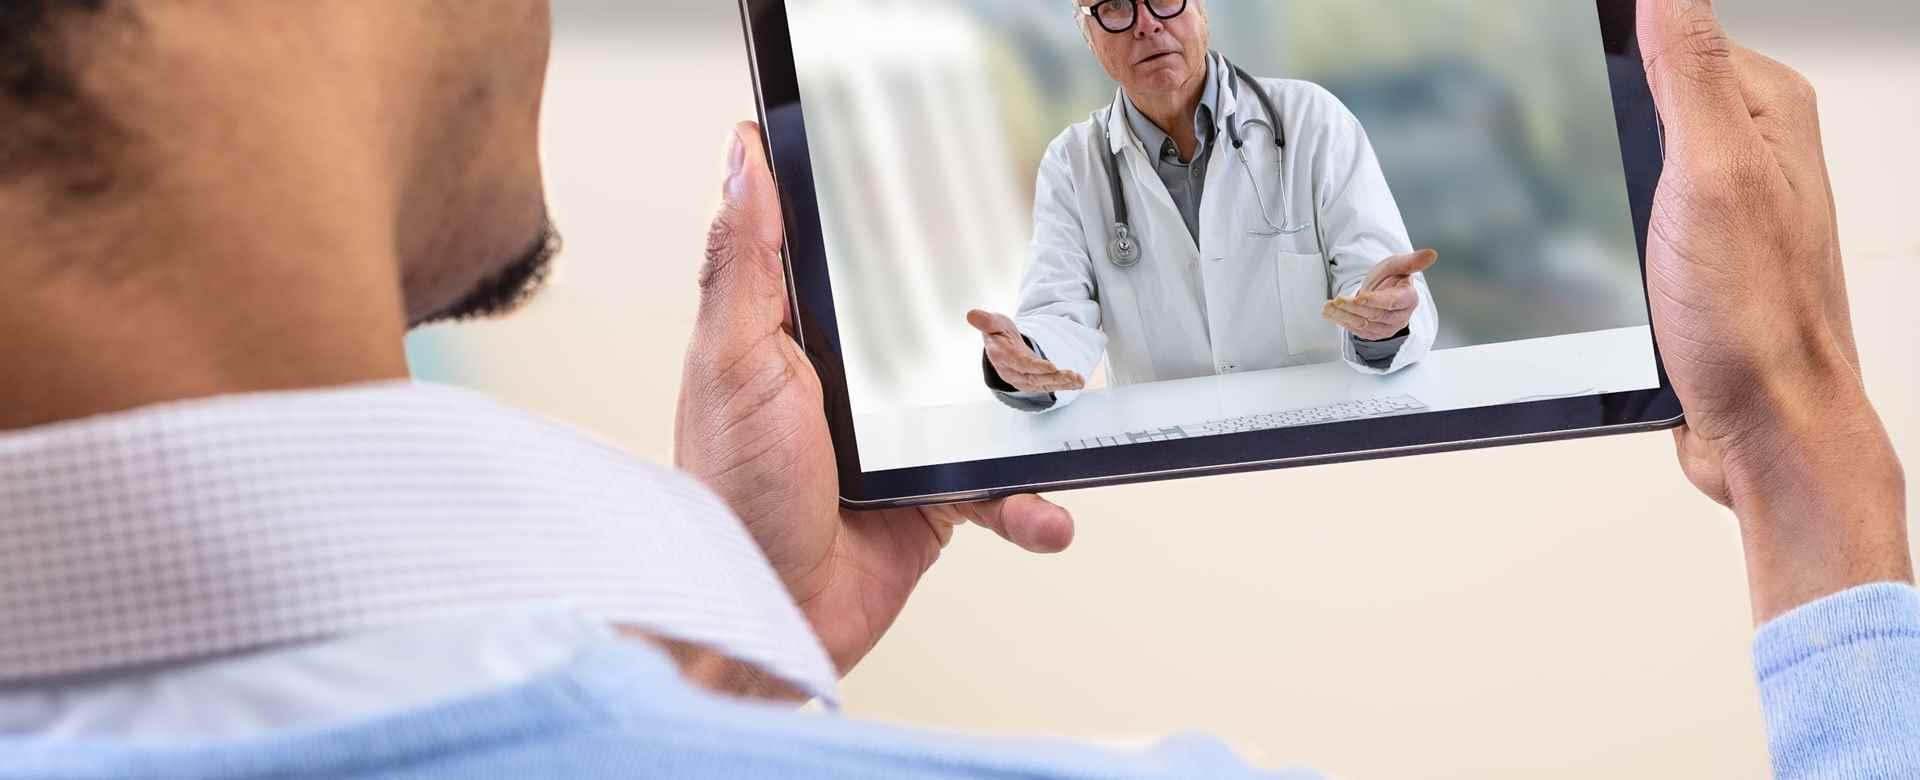 How Telehealth is providing Quality Healthcare to Veterans